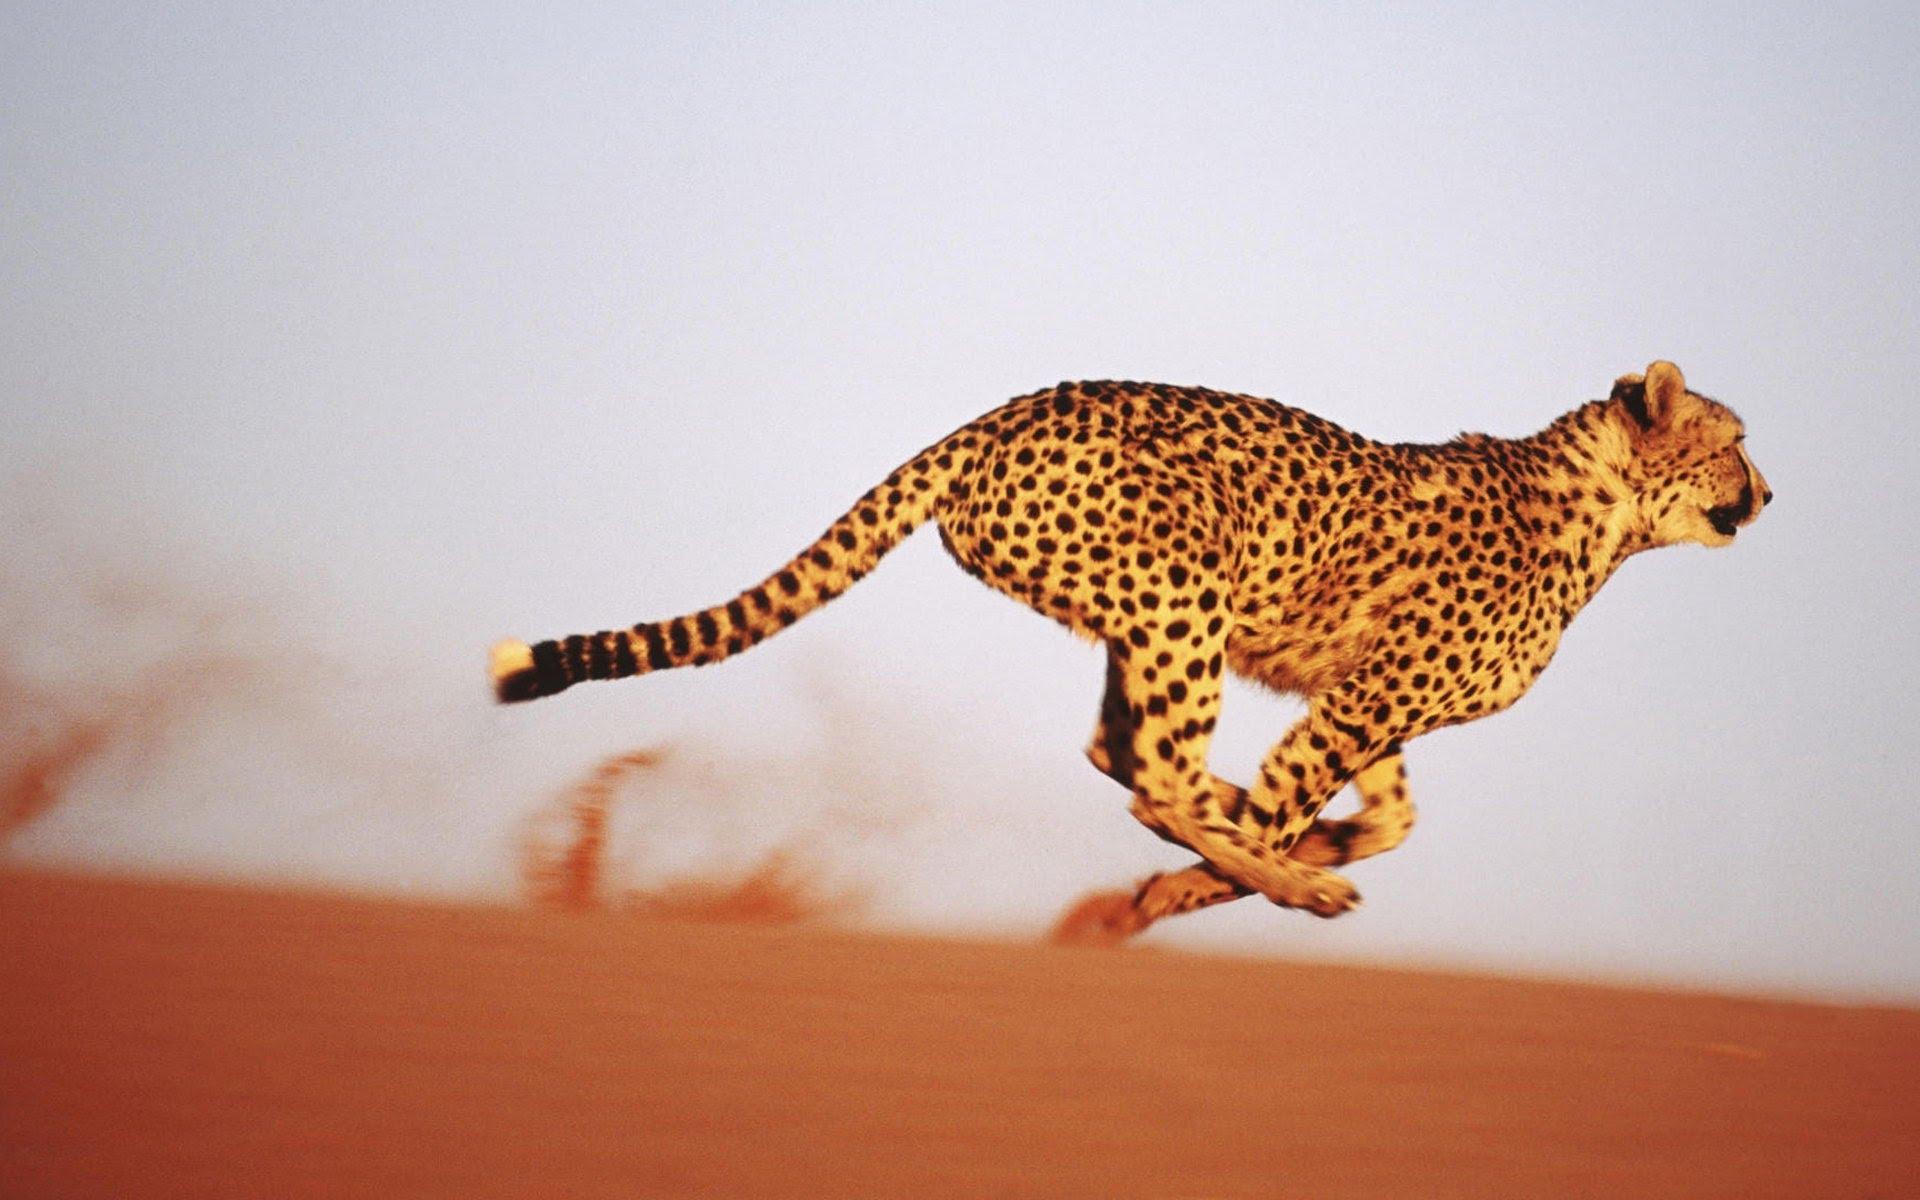 Animated Cheetah Wallpaper fun pics & images